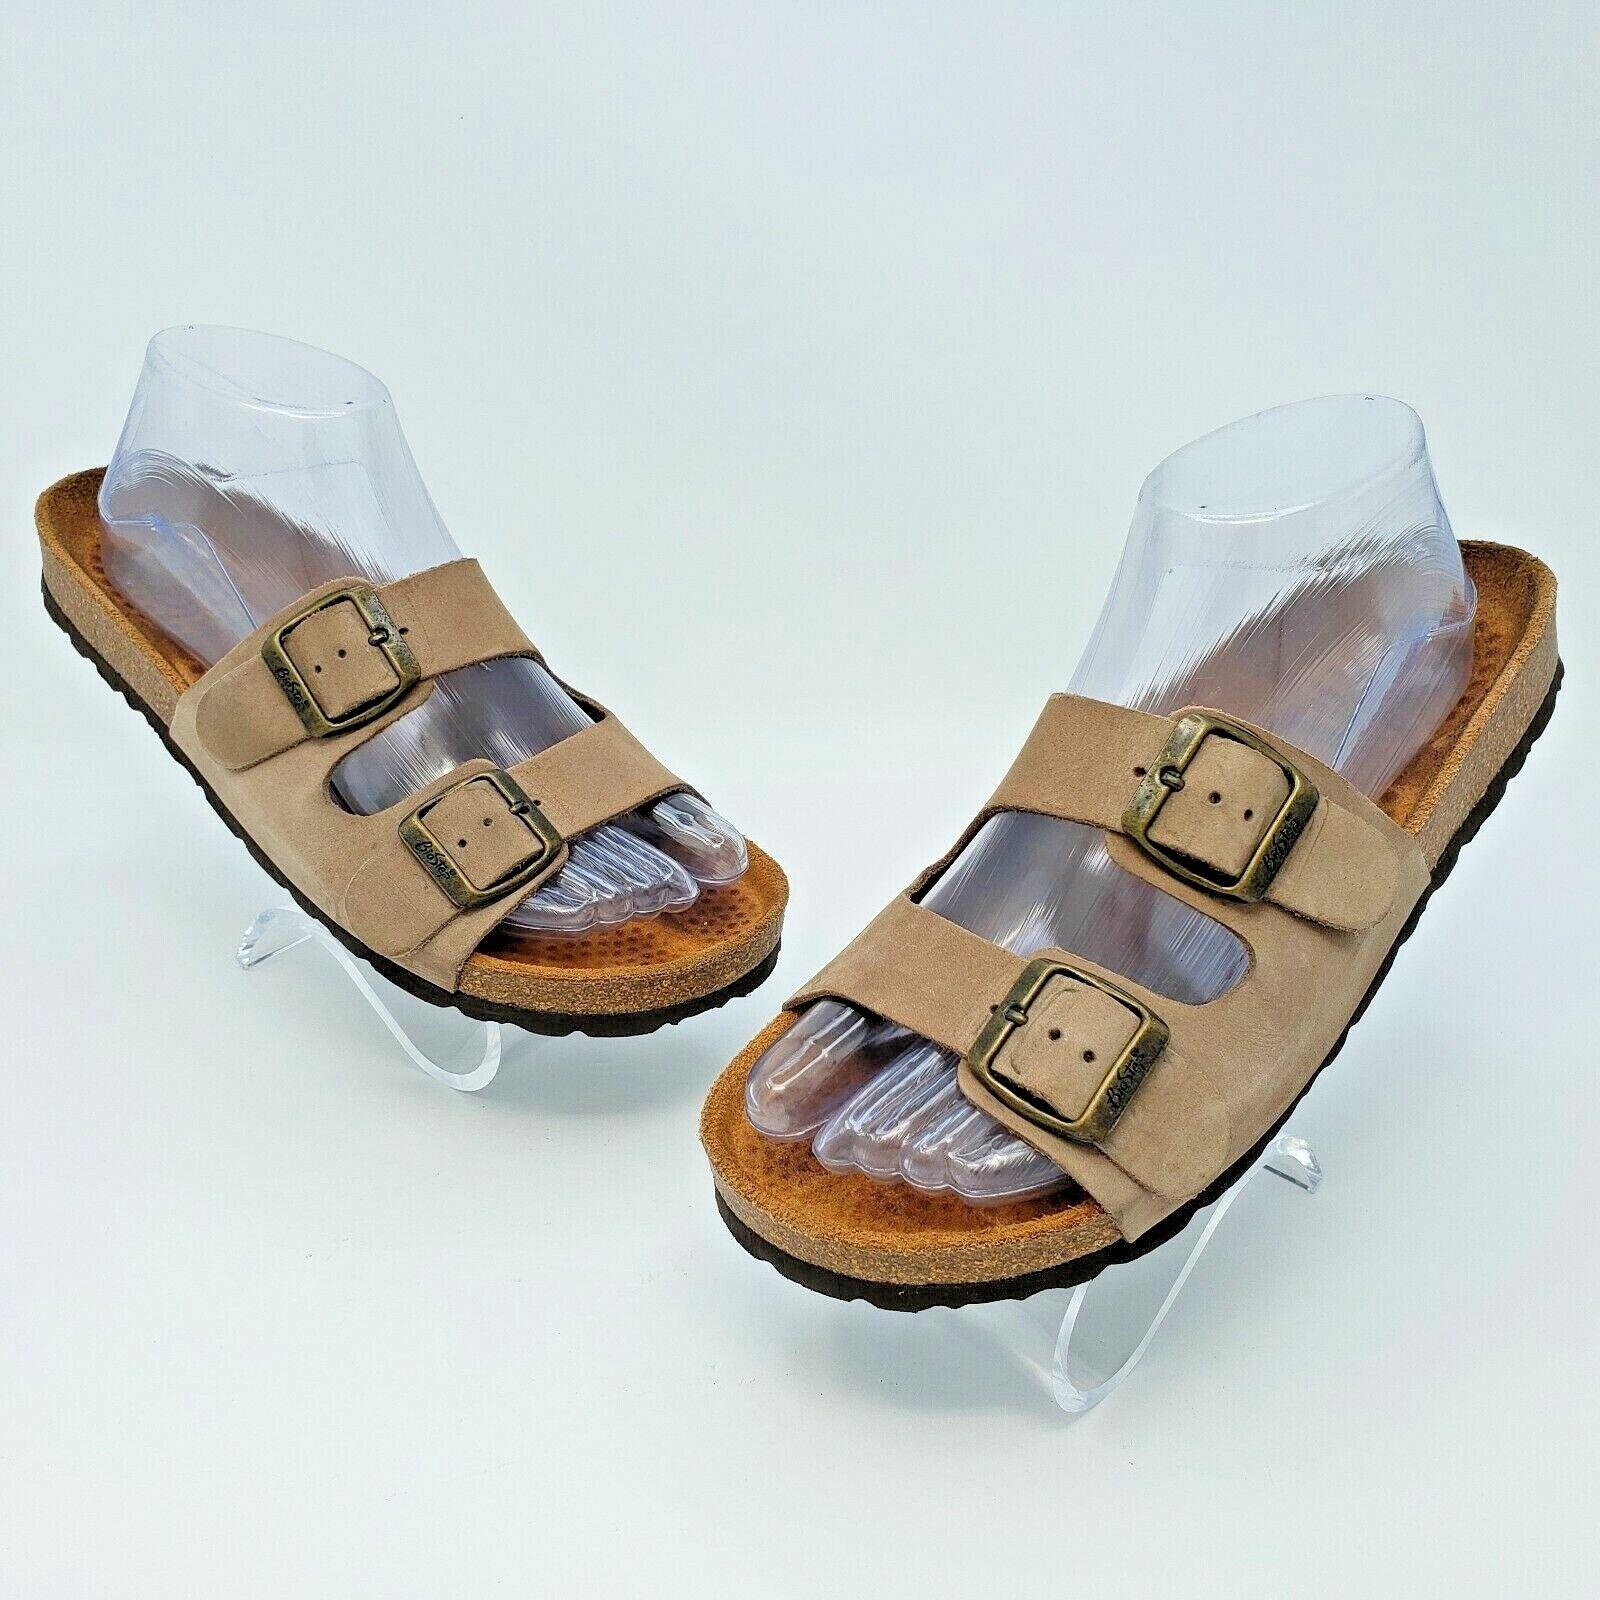 Biostep Femme Marron Clair En Daim Double Sangle Confort Sandales Made in Spain size 8 US